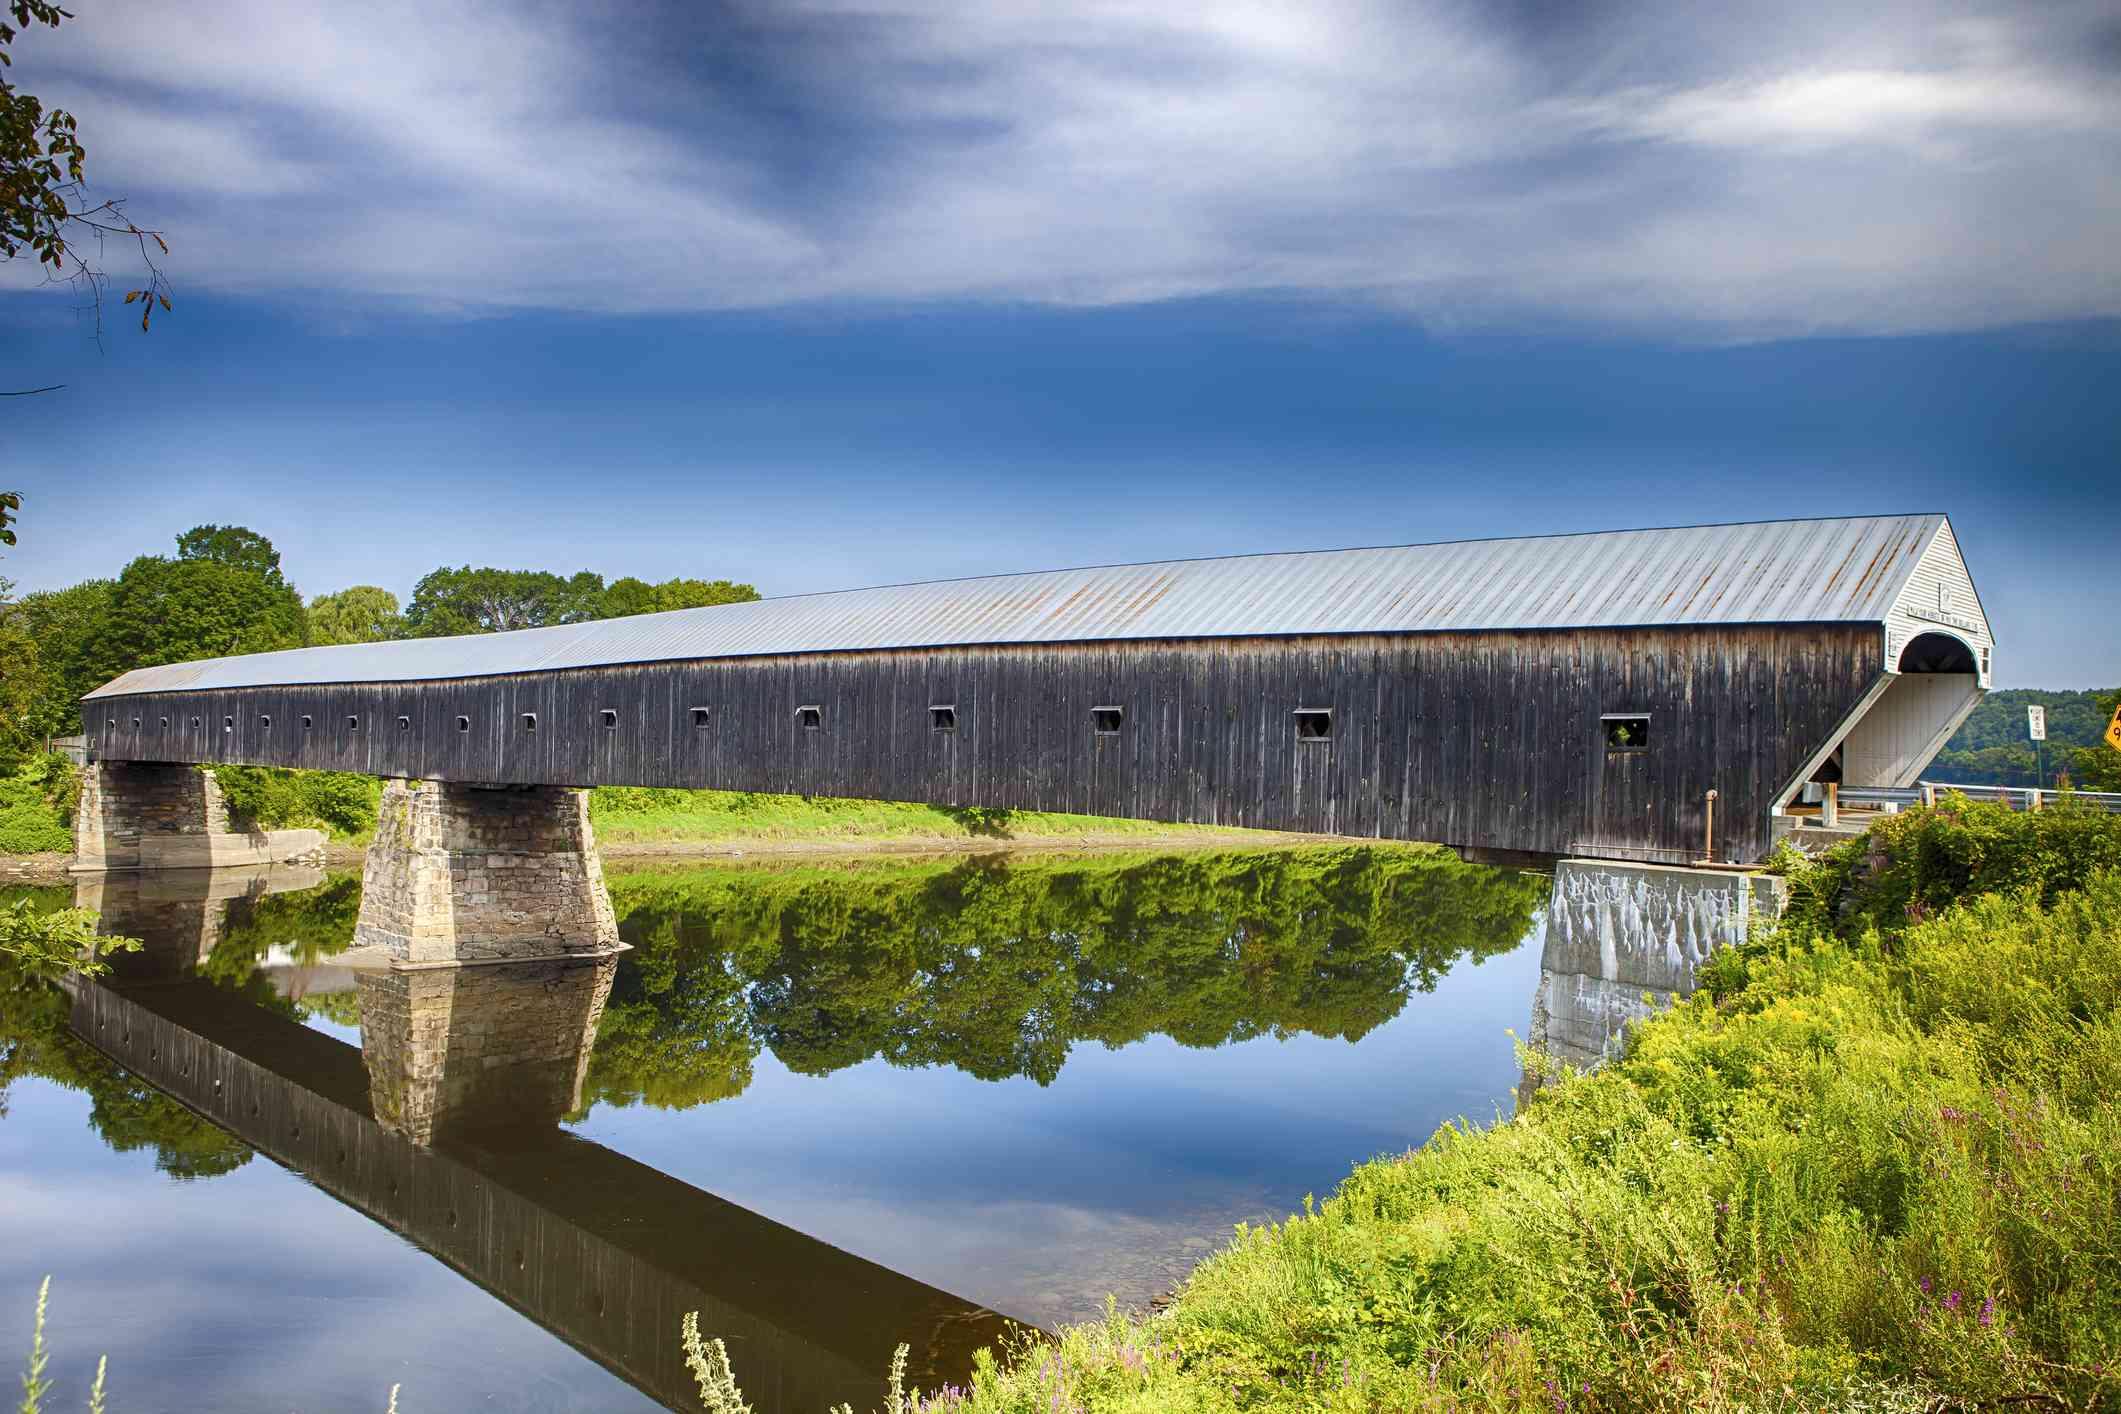 Cornish-Windsor Covered Bridge New England